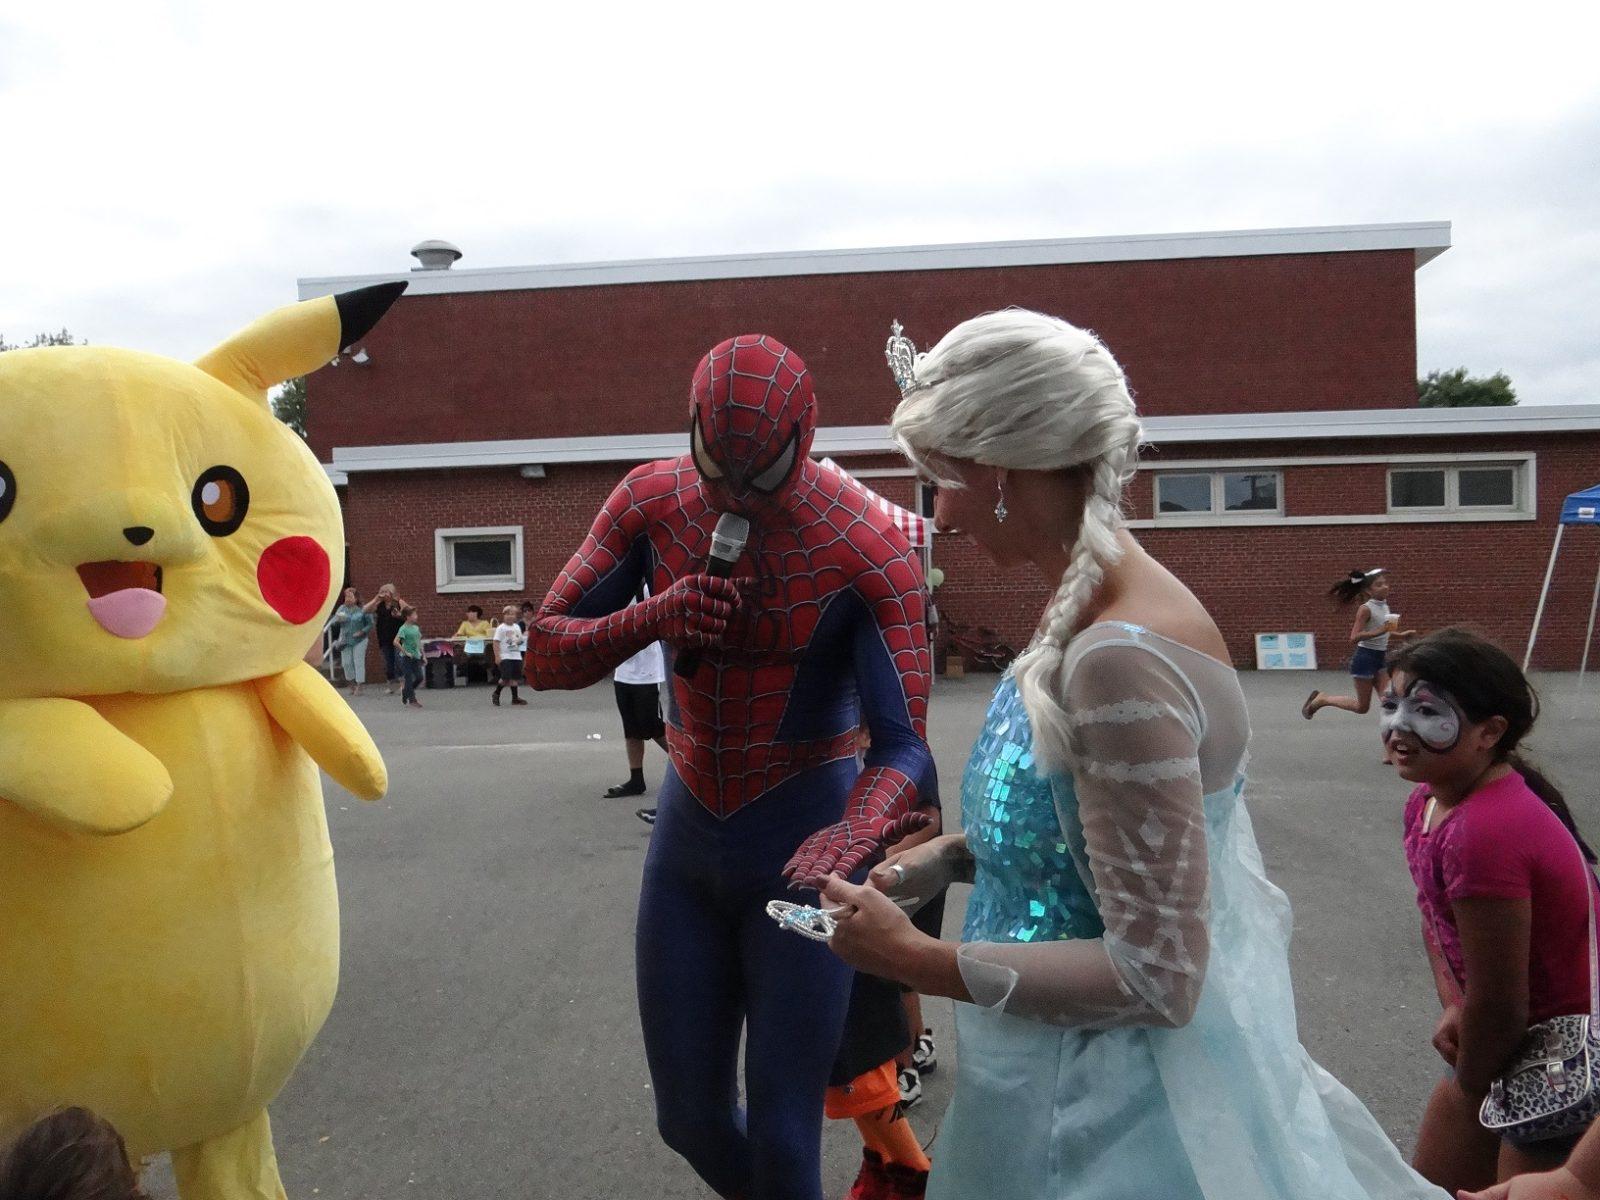 Pikachu,Frozen Princess Elsa,Spiderman